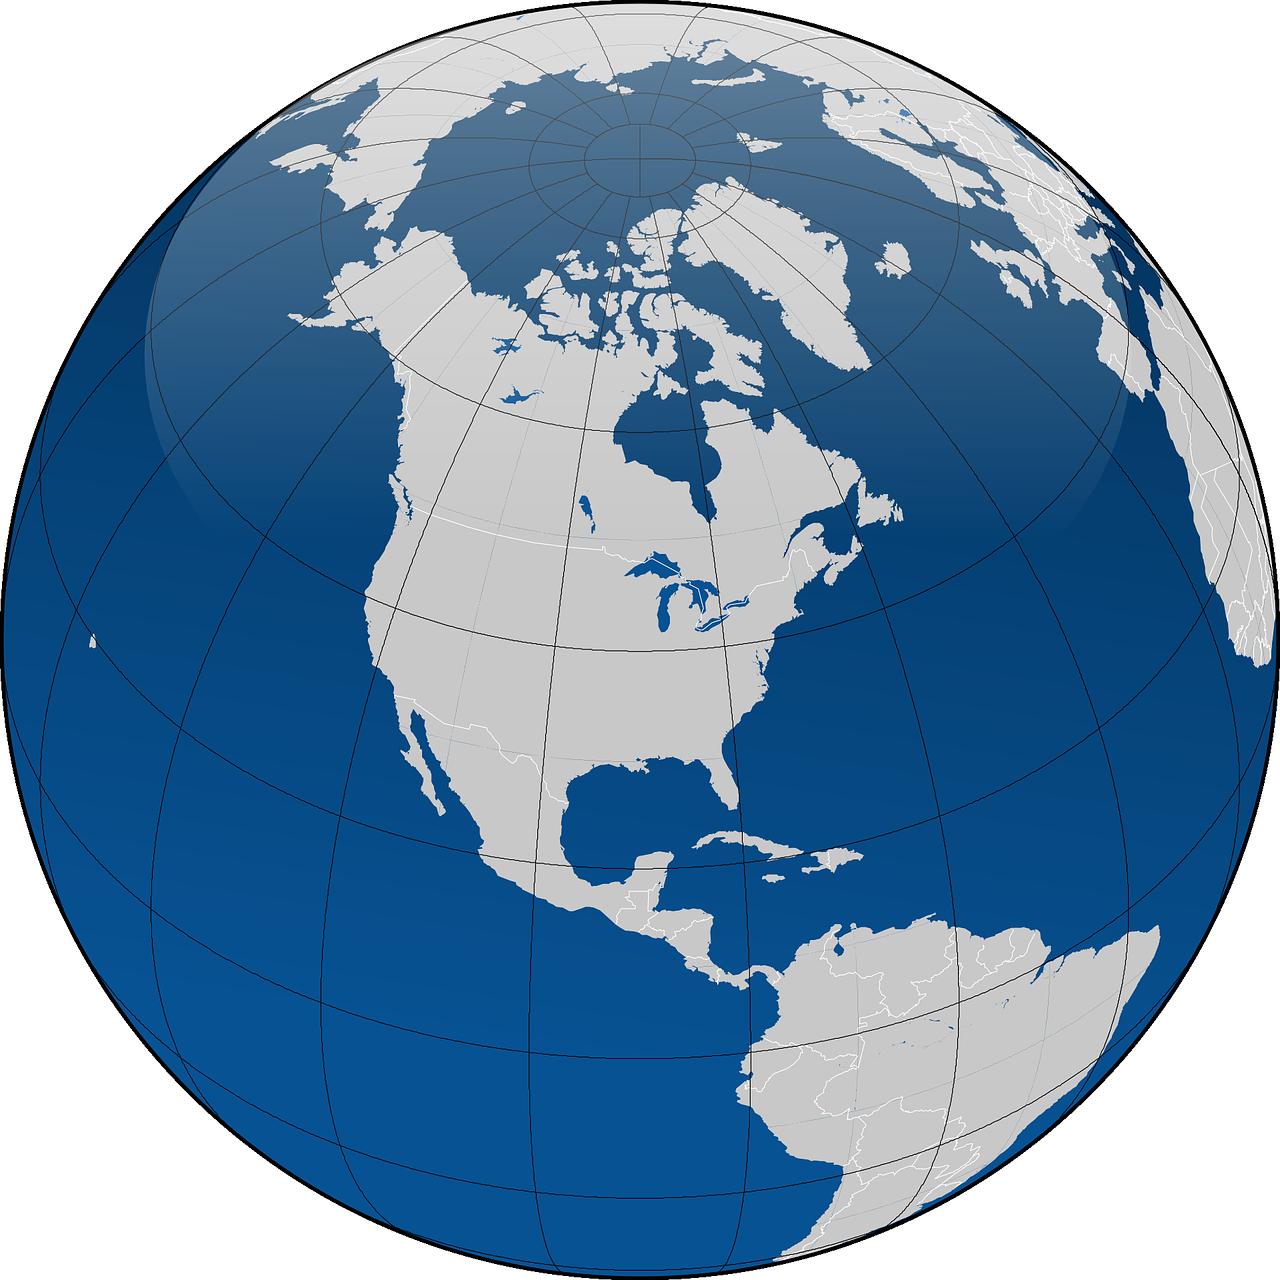 Imagen del globo terráqueo